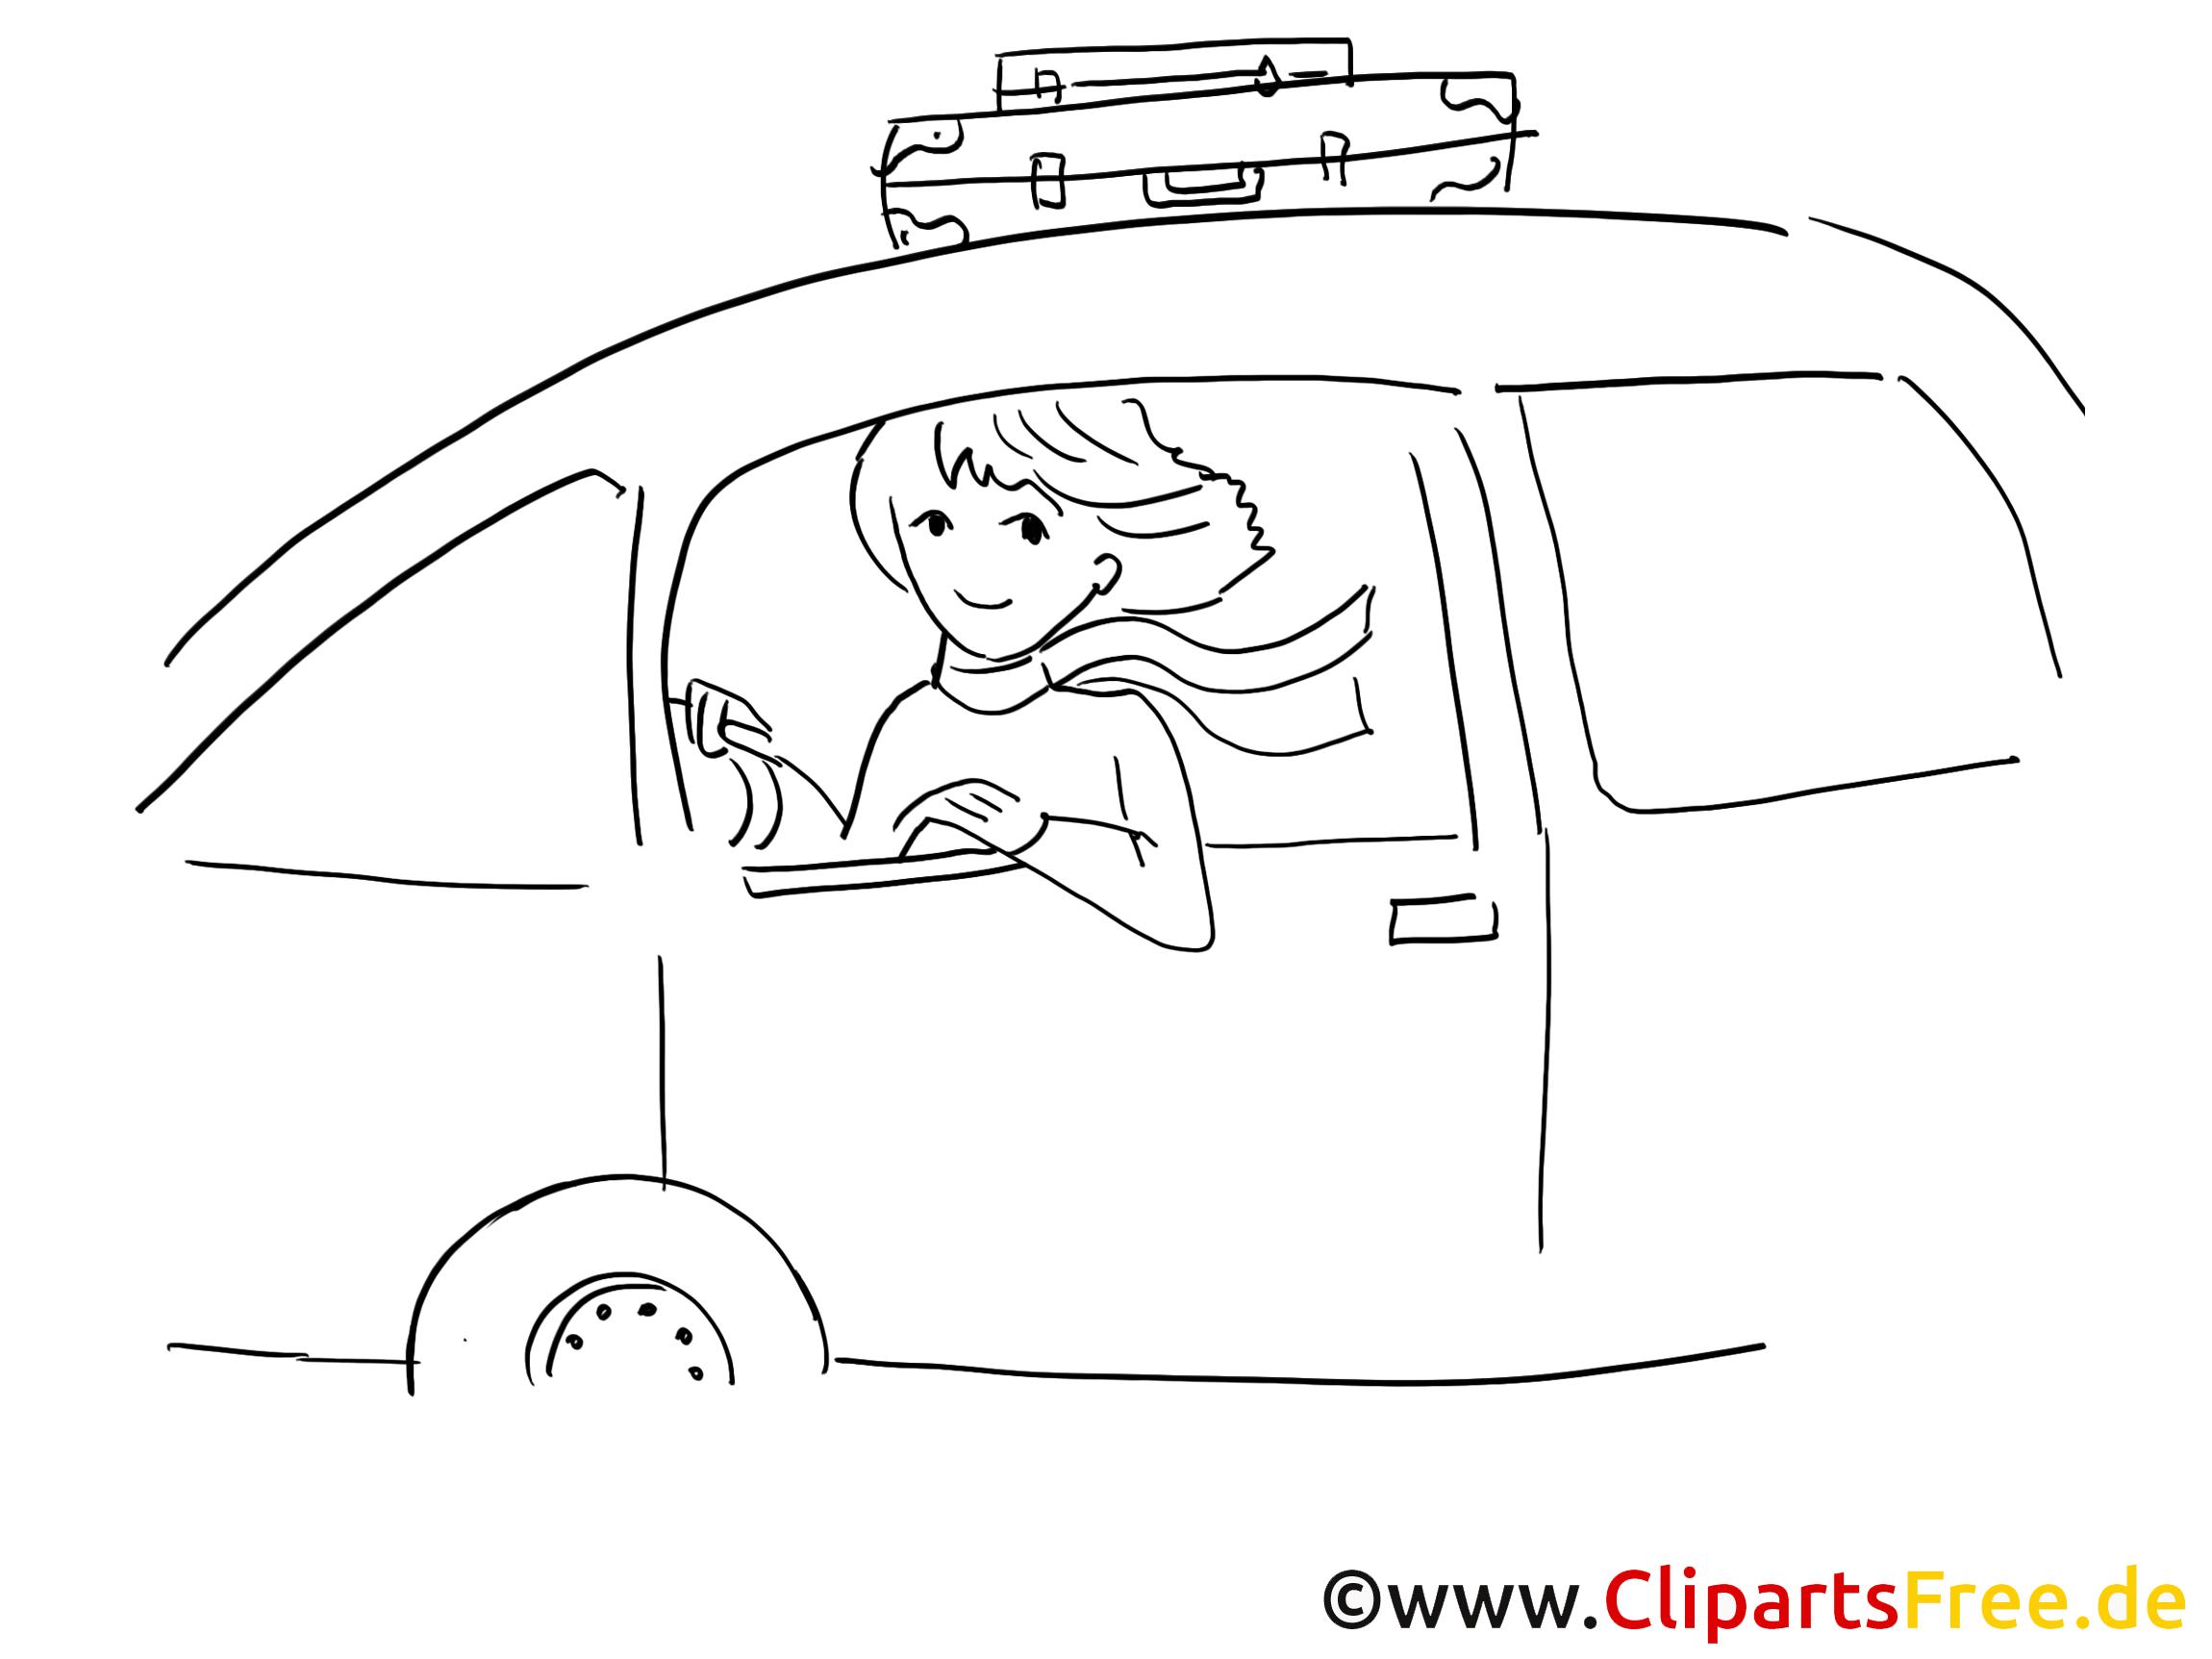 Women driving car clip art, graphic, pic, cartoon, comic free